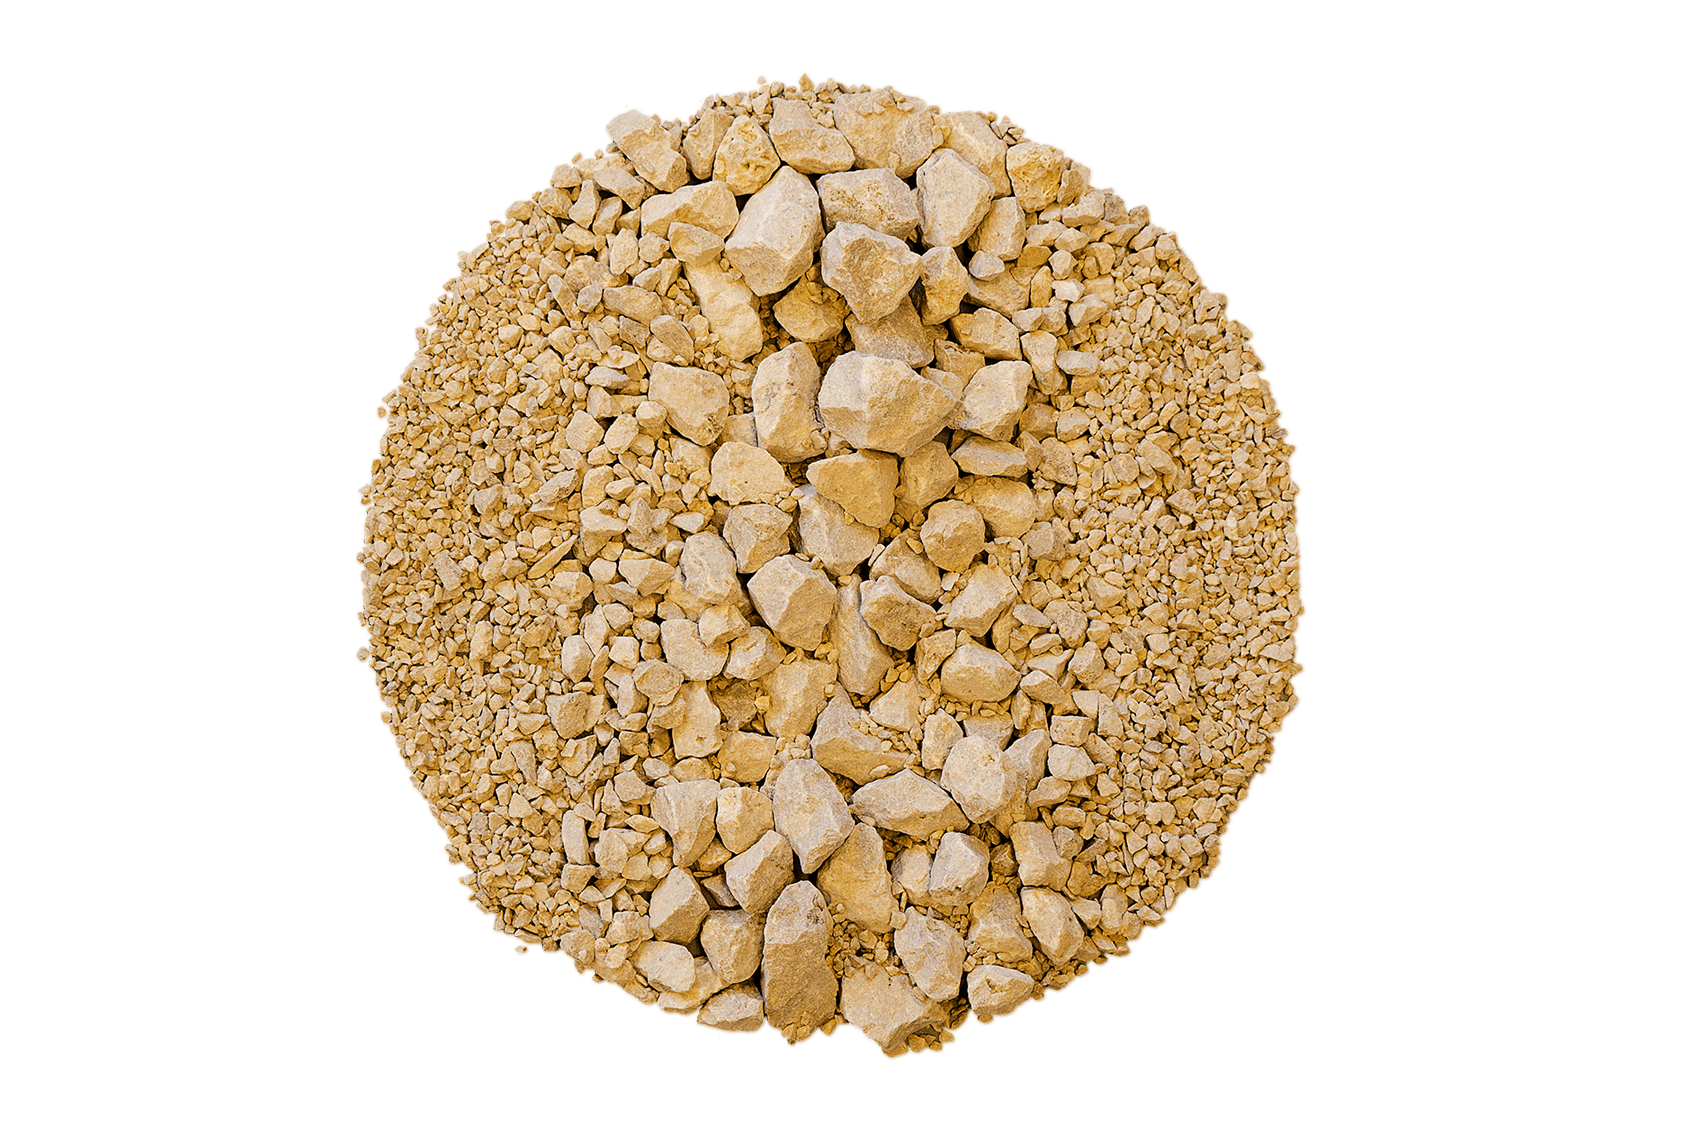 Yellow eifeldolomite